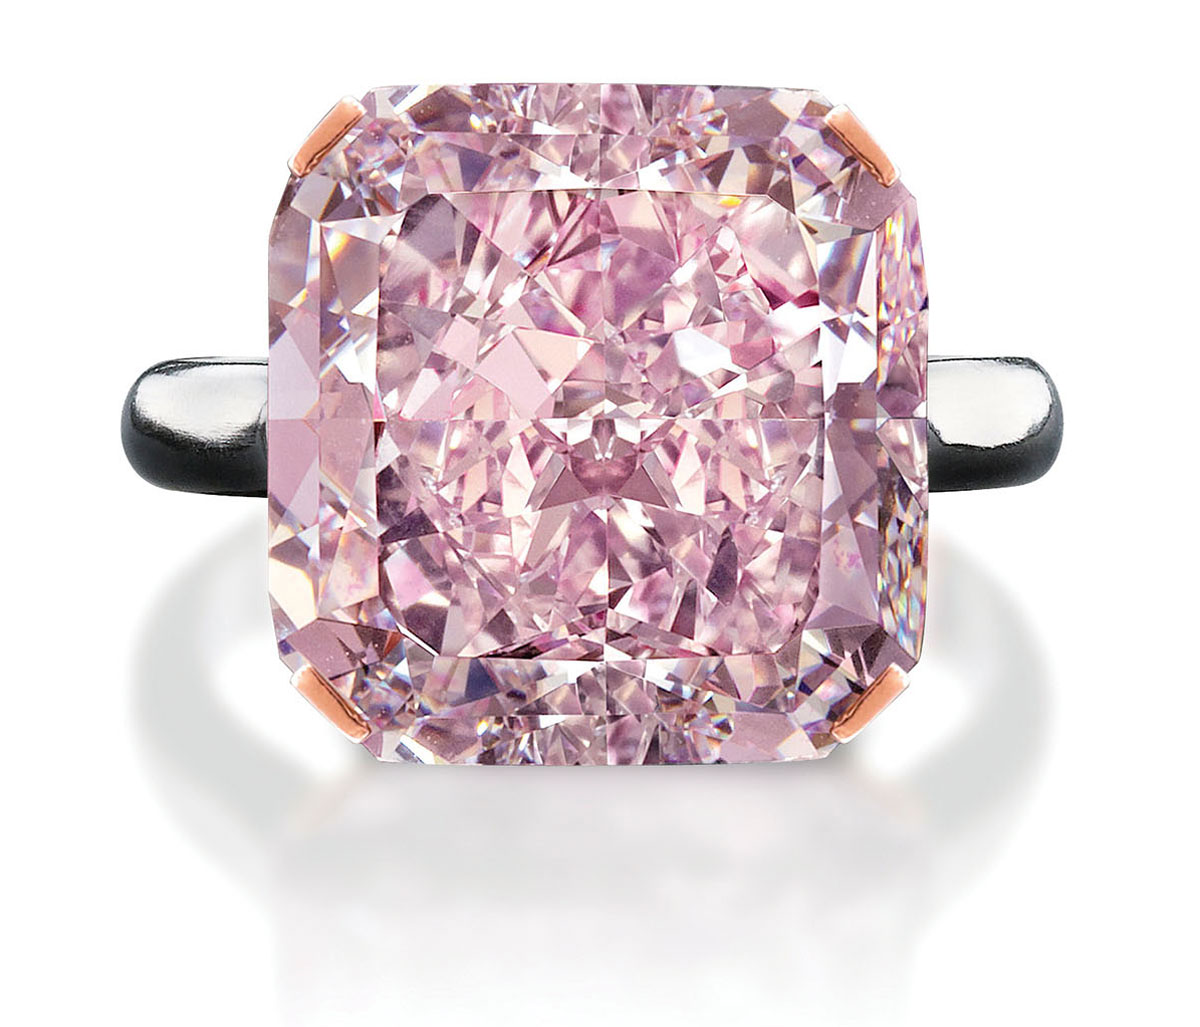 Rare 10 Carat Light Purplish Pink Diamond At Edmonton